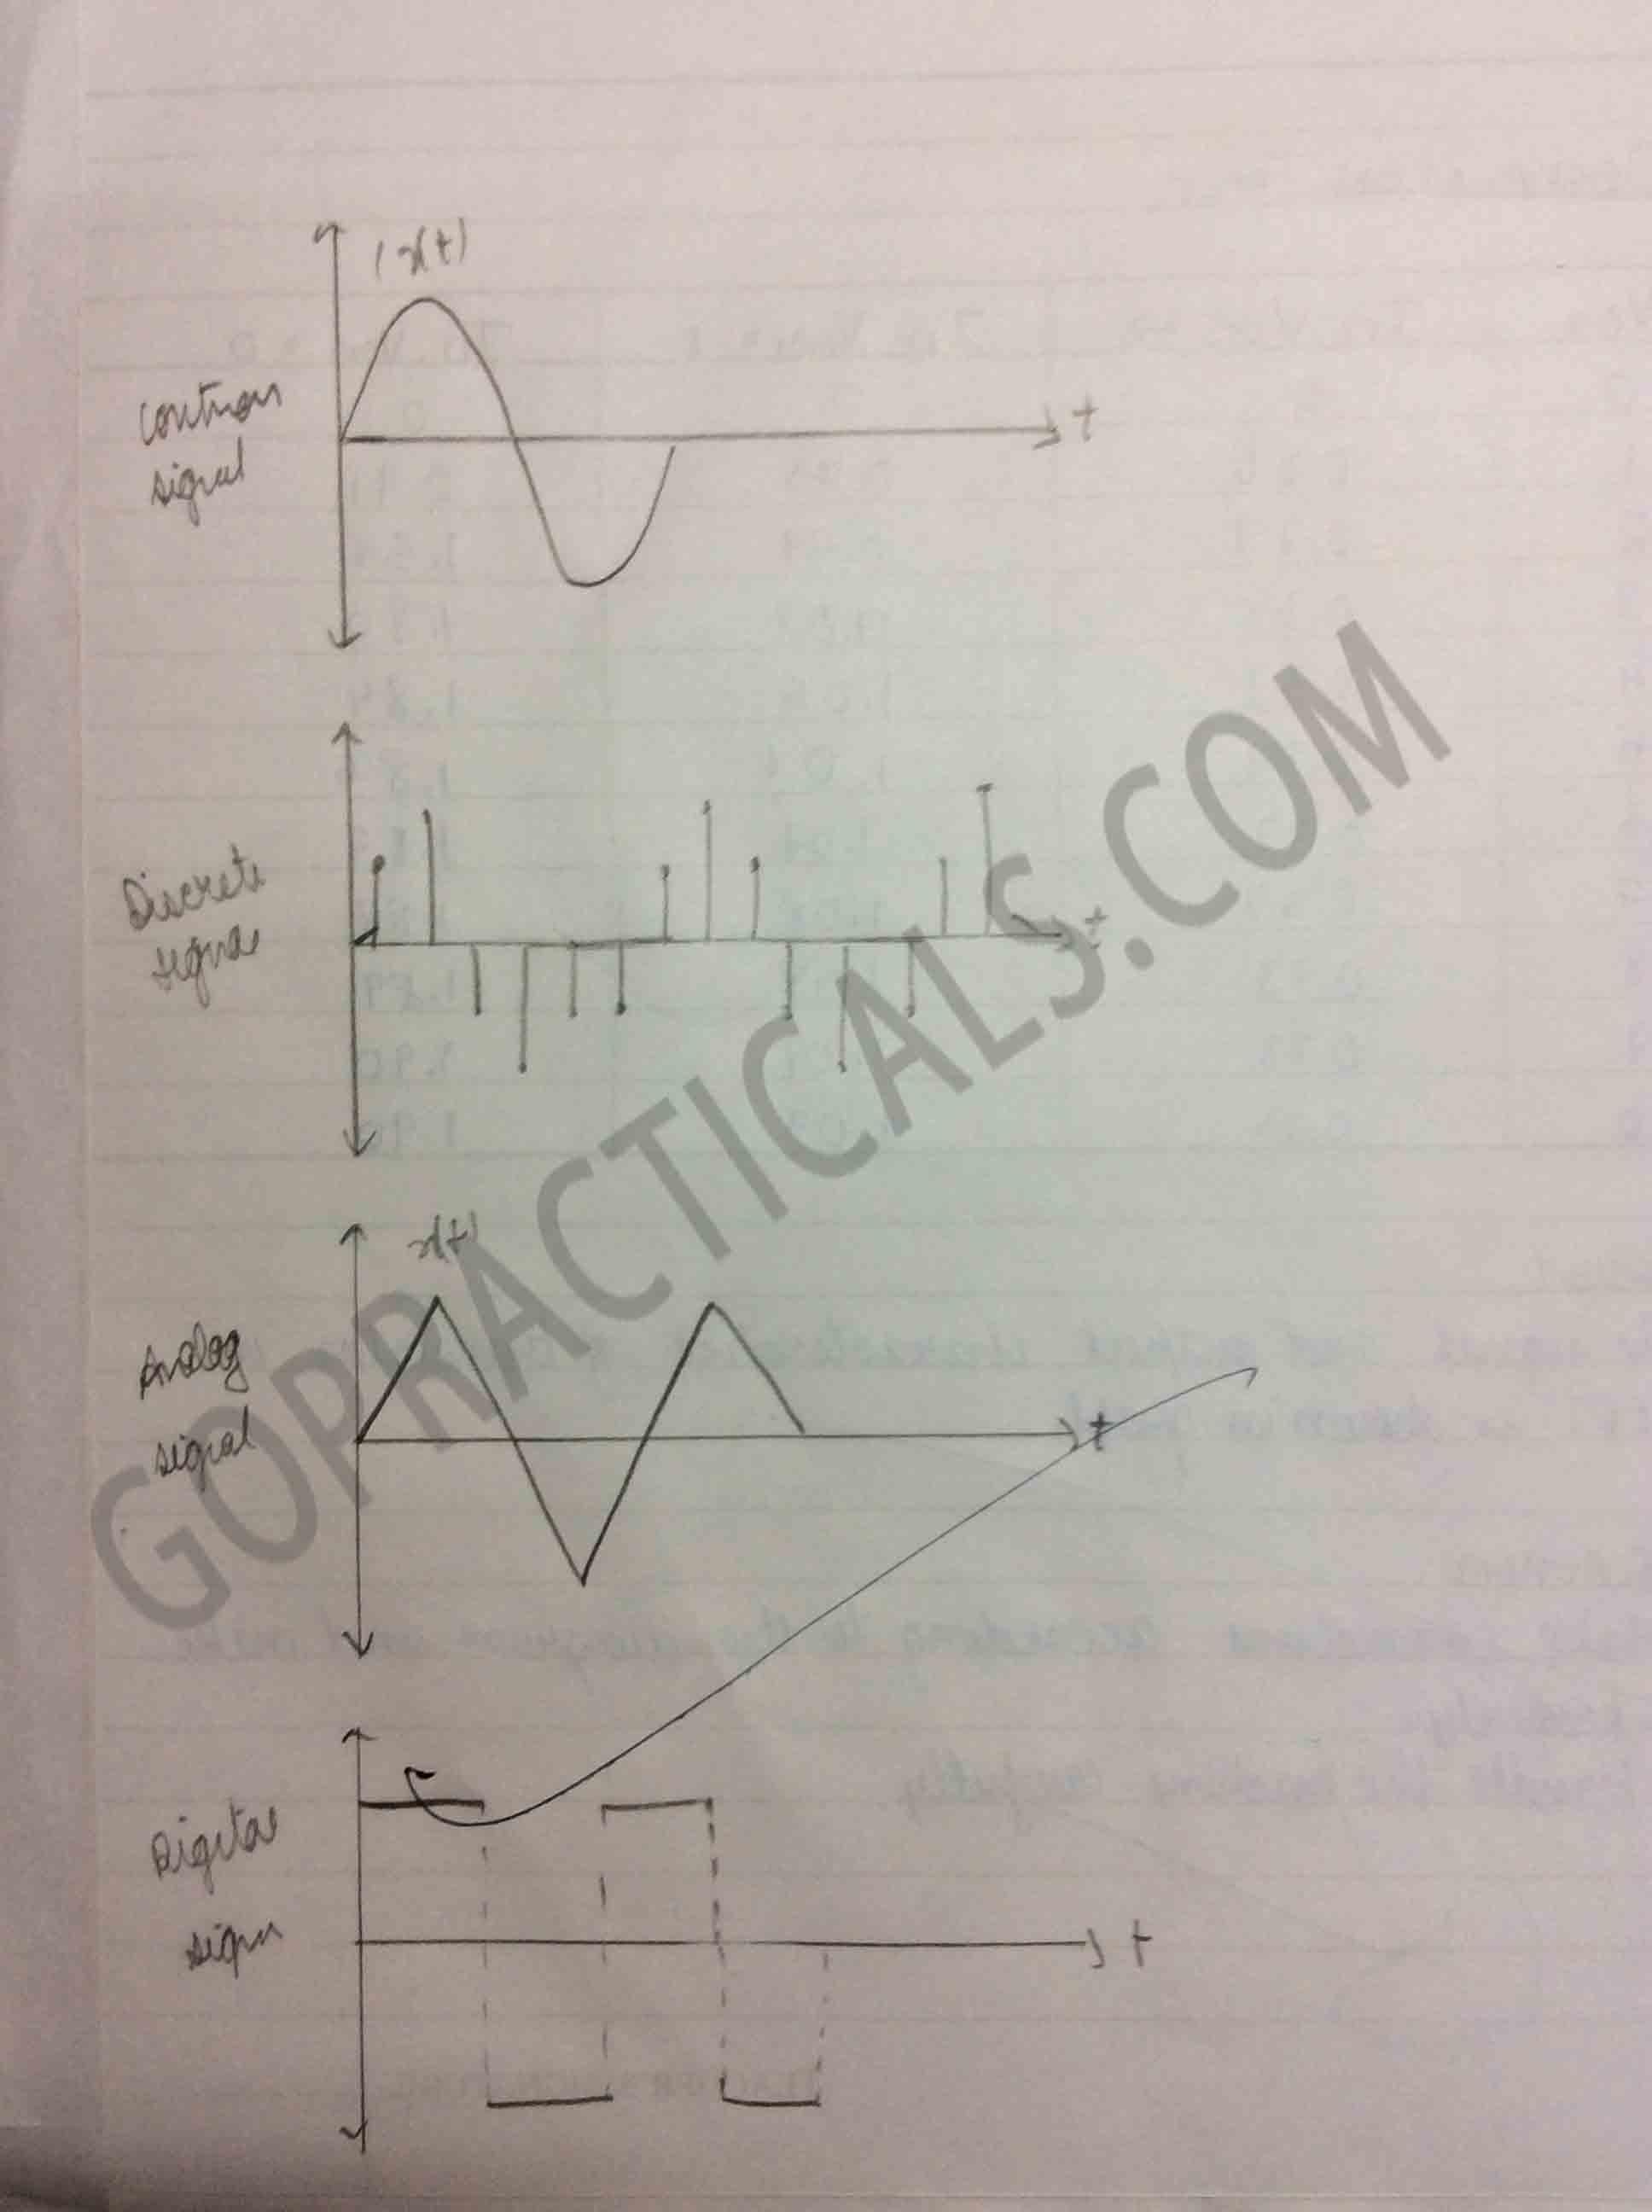 Calibration of Voltmeter-1